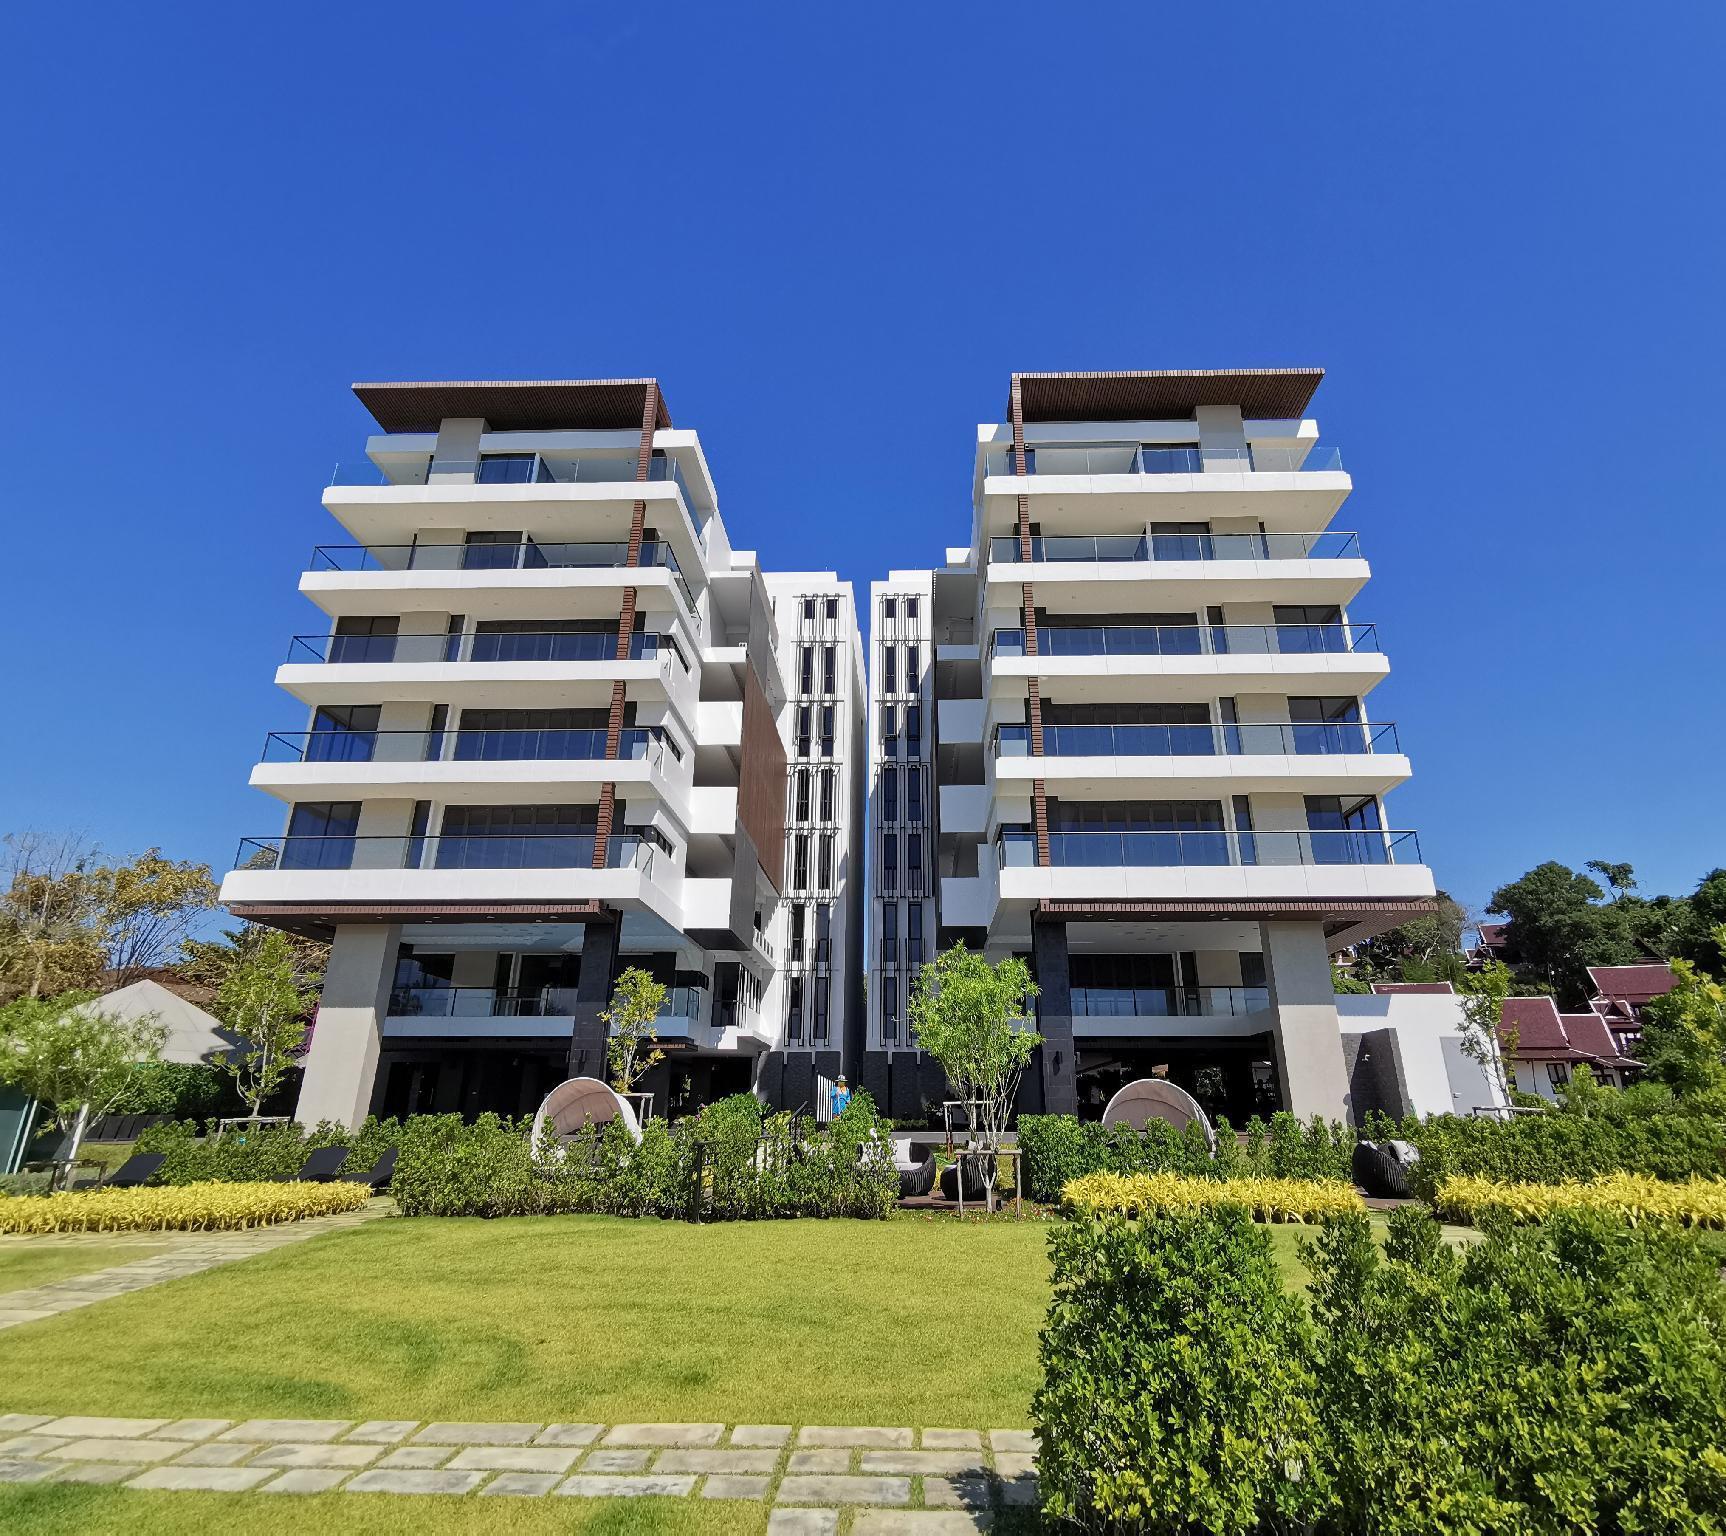 Laem Mae Phim Beachfront Escape Condominium by Jay อพาร์ตเมนต์ 1 ห้องนอน 1 ห้องน้ำส่วนตัว ขนาด 43 ตร.ม. – ตัวเมืองระยอง